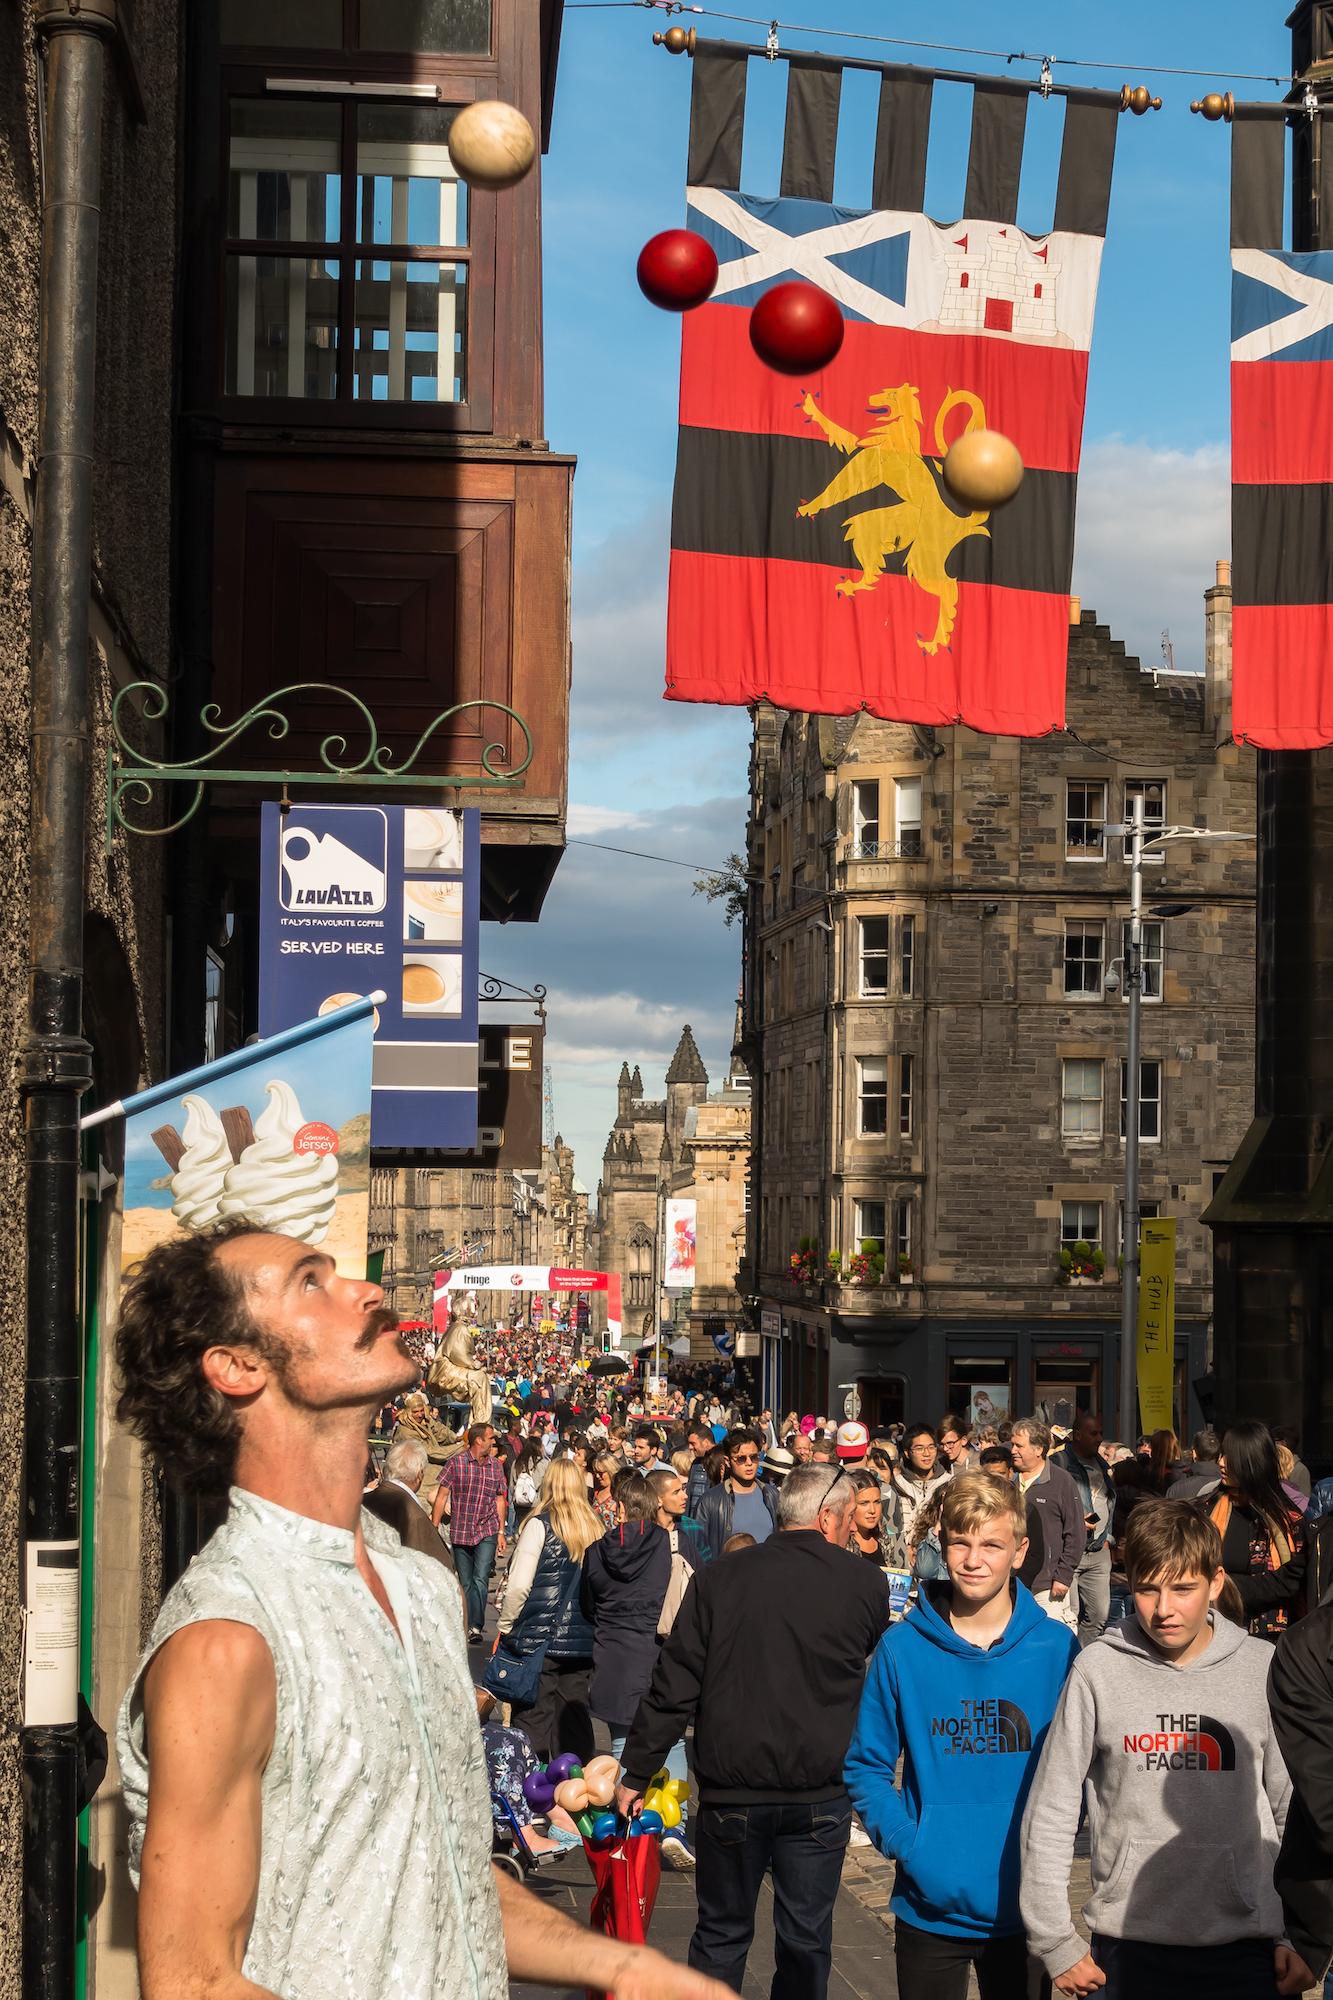 (219) Juggler on Royal Mile, Castlehill, Edinburgh Festival Fringe, Edinburgh, Scotland.jpg